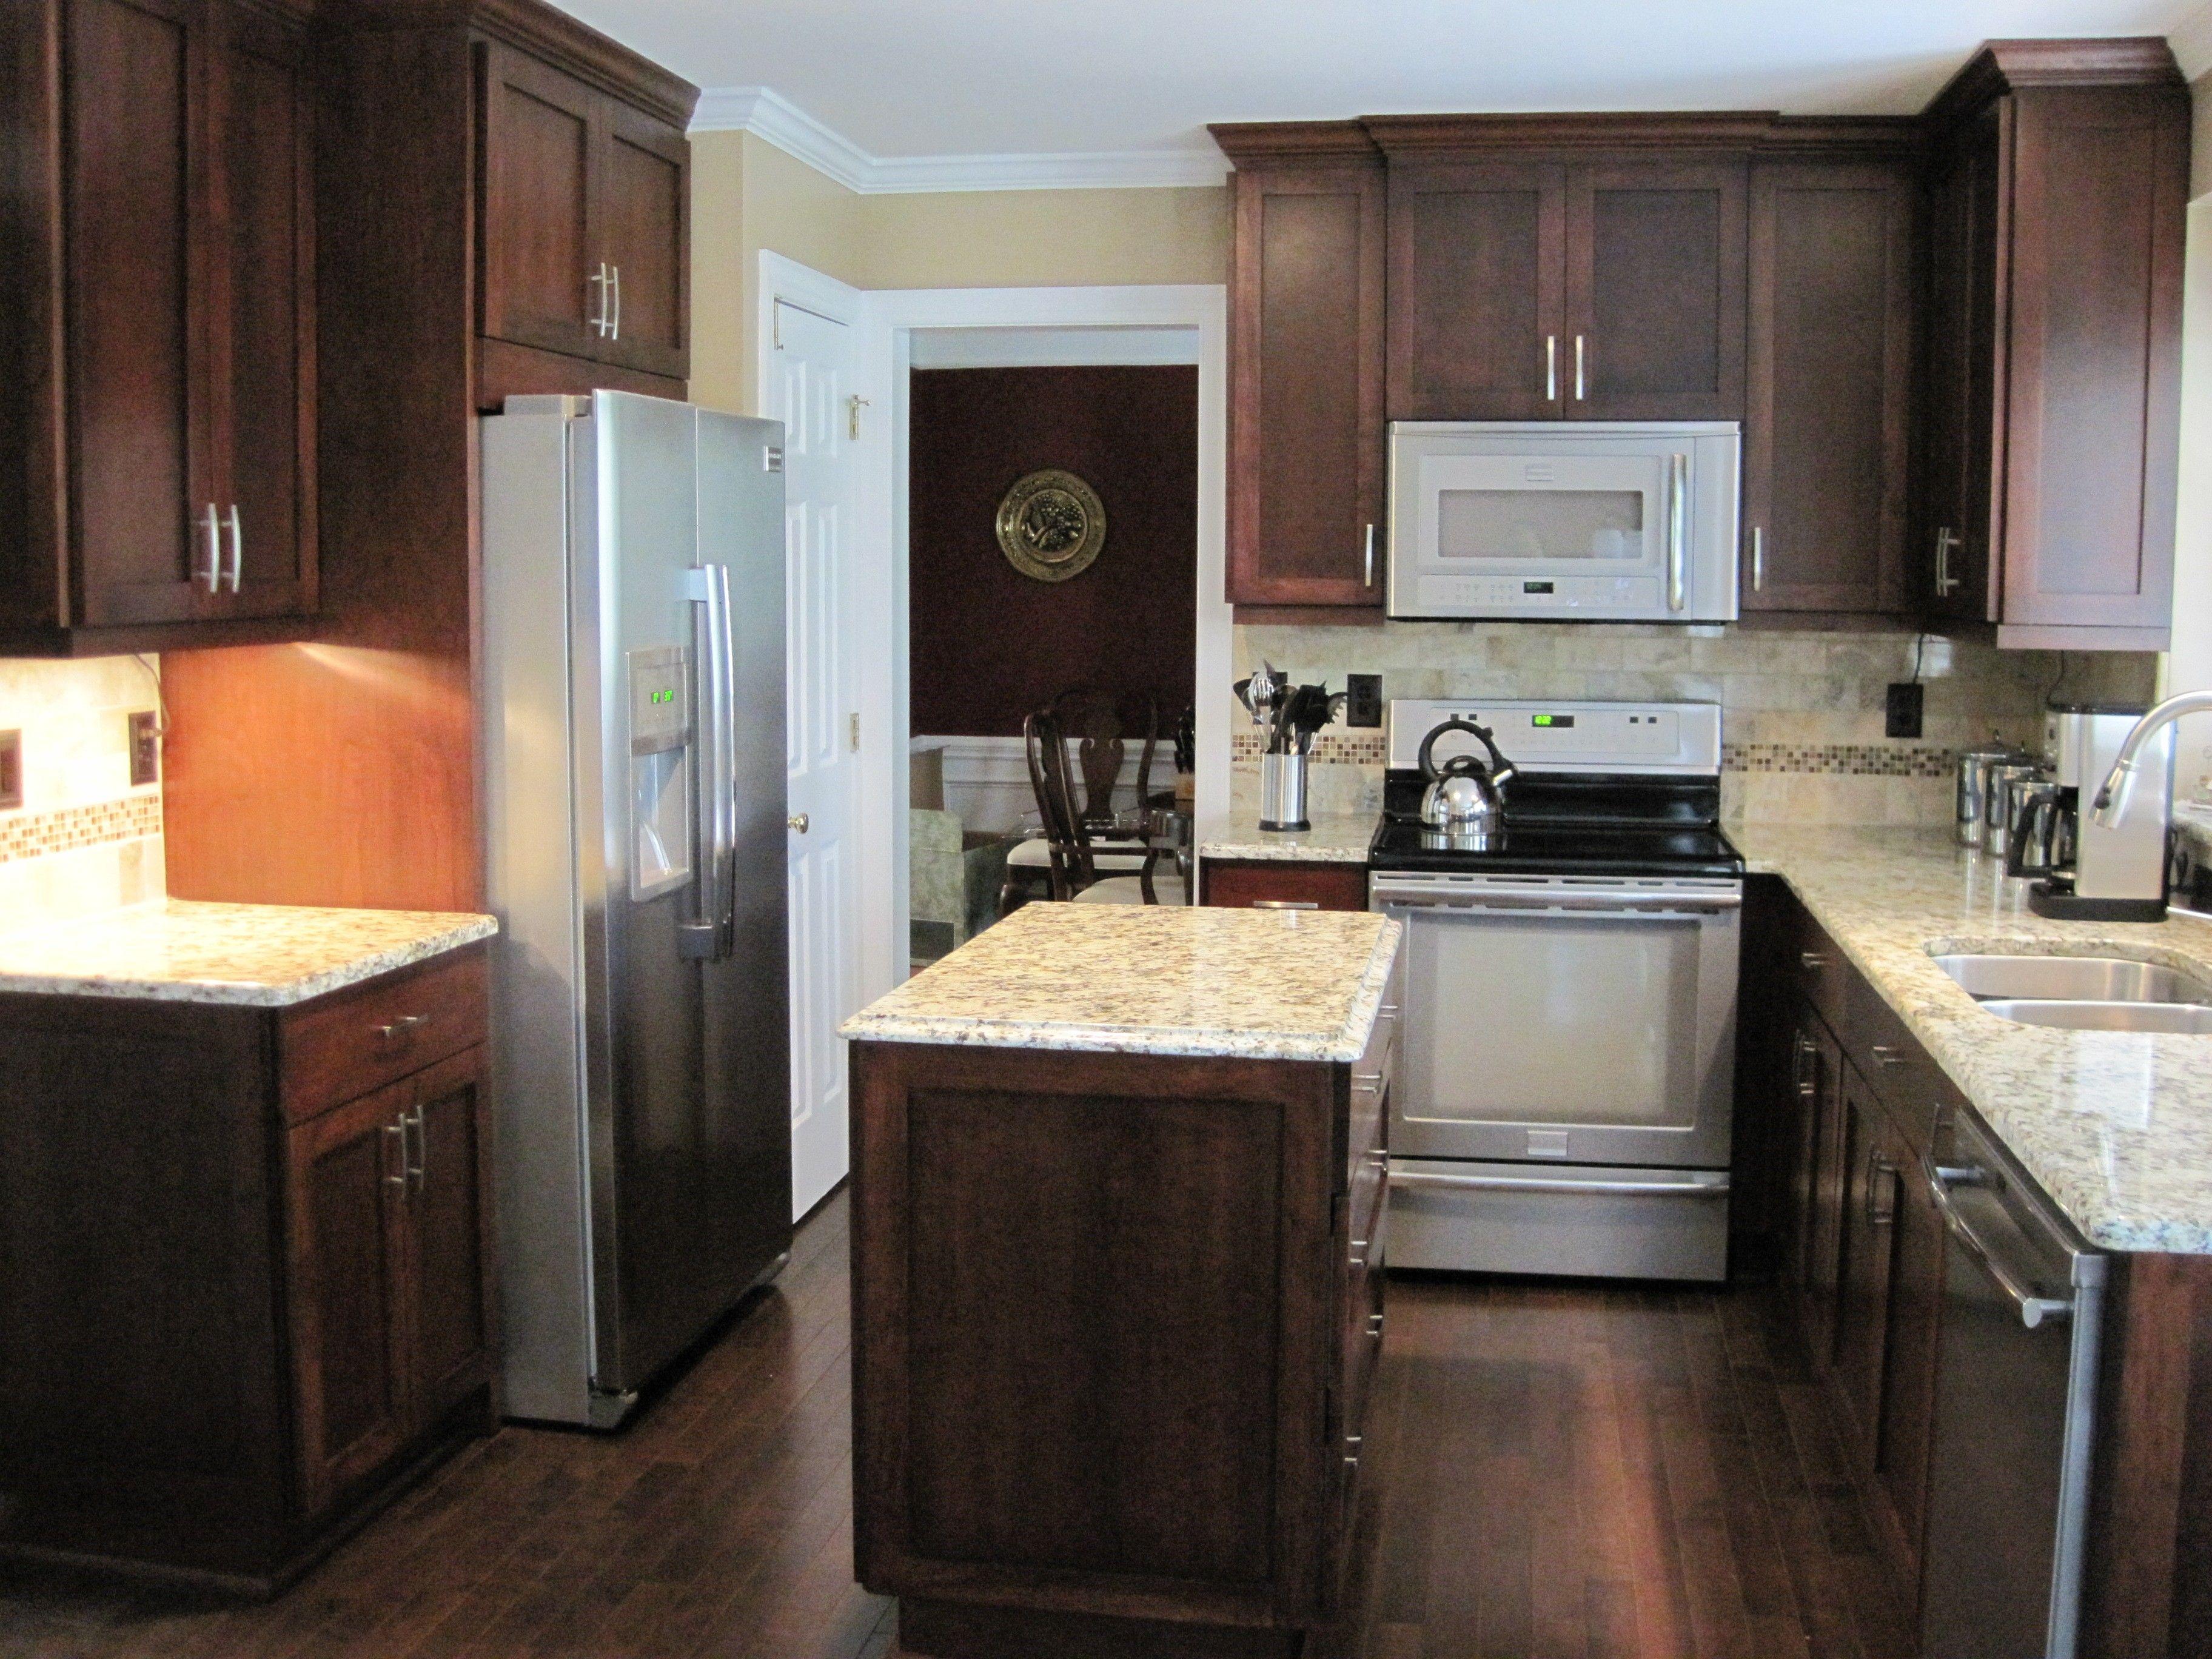 Cherry Wood Finish Kitchen Cabinets With Napoli Granite Countertops